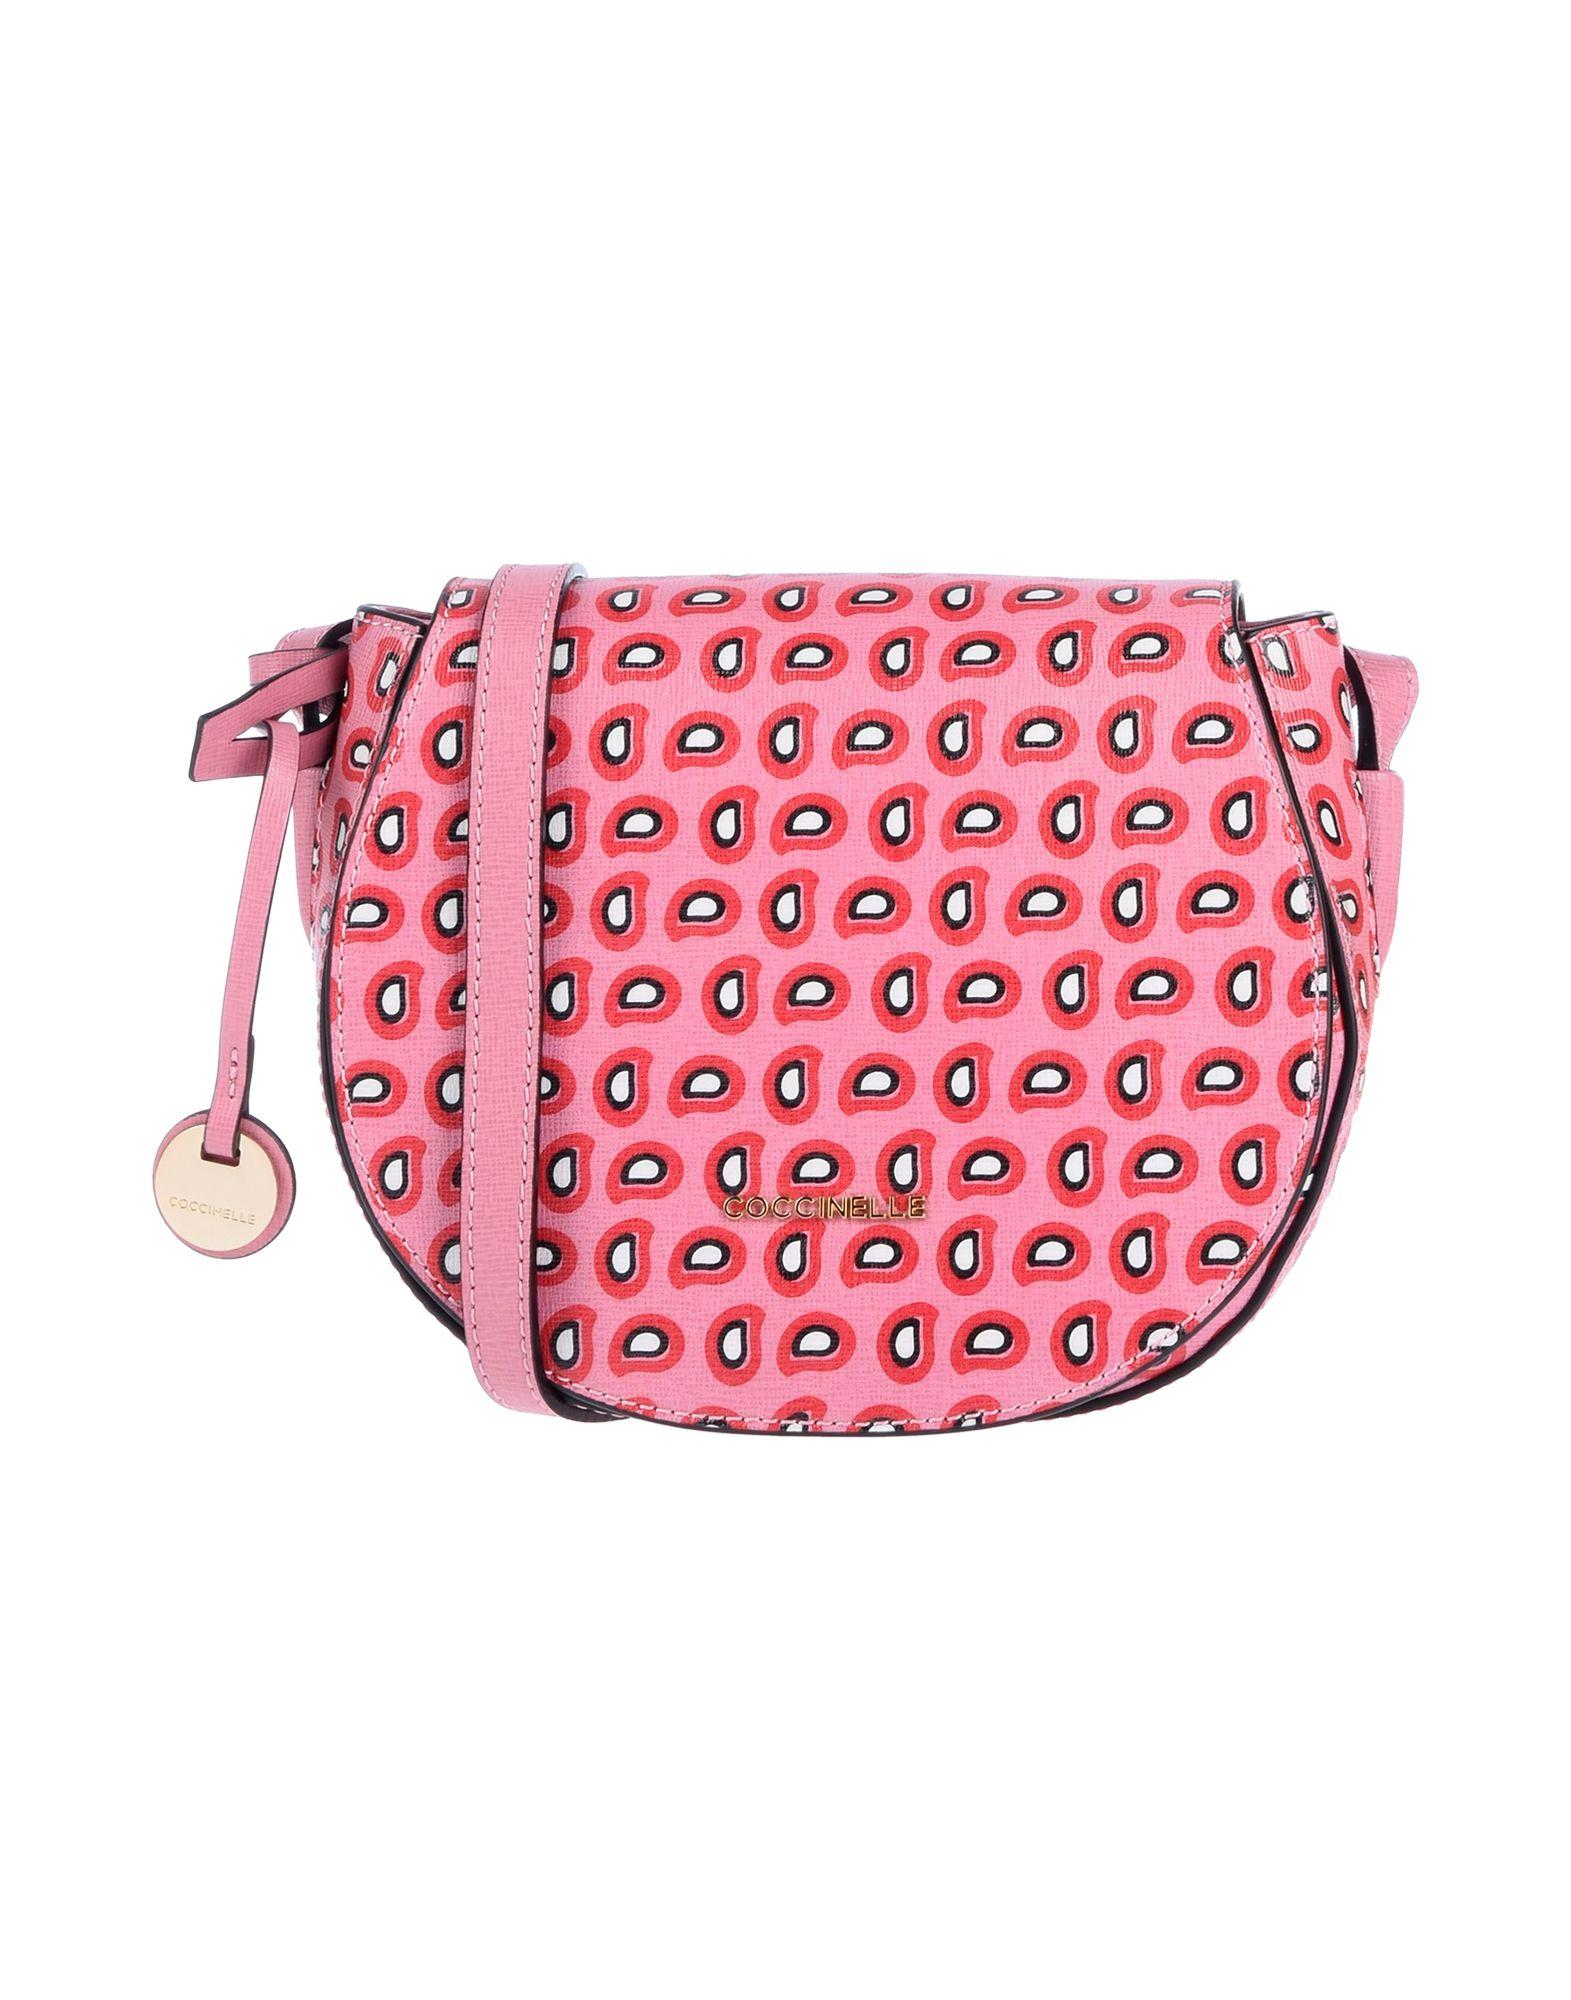 COCCINELLE Сумка через плечо сумка coccinelle e1 bd5 55 b7 01 240